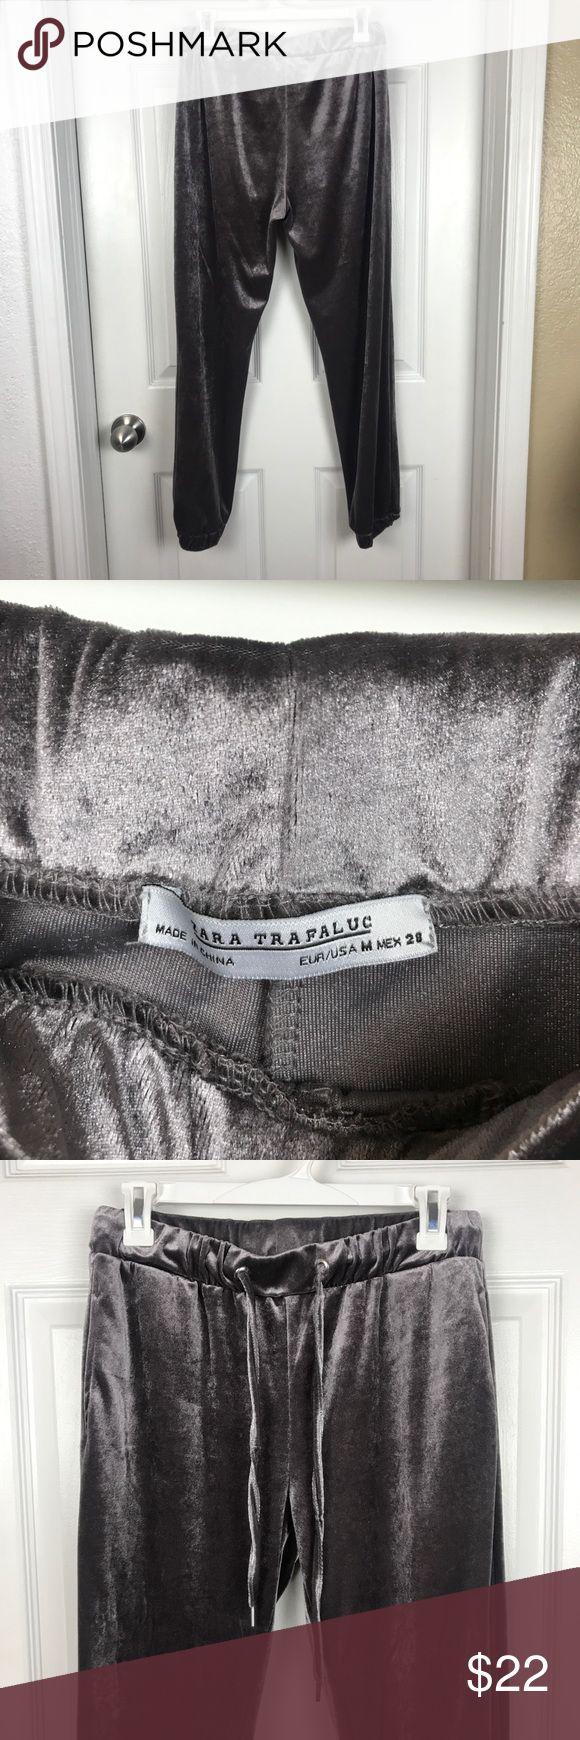 Velvet Zara joggers Velvet Zara joggers. Size M. Only worn once, perfect condition. Insanely soft. Zara Pants Track Pants & Joggers